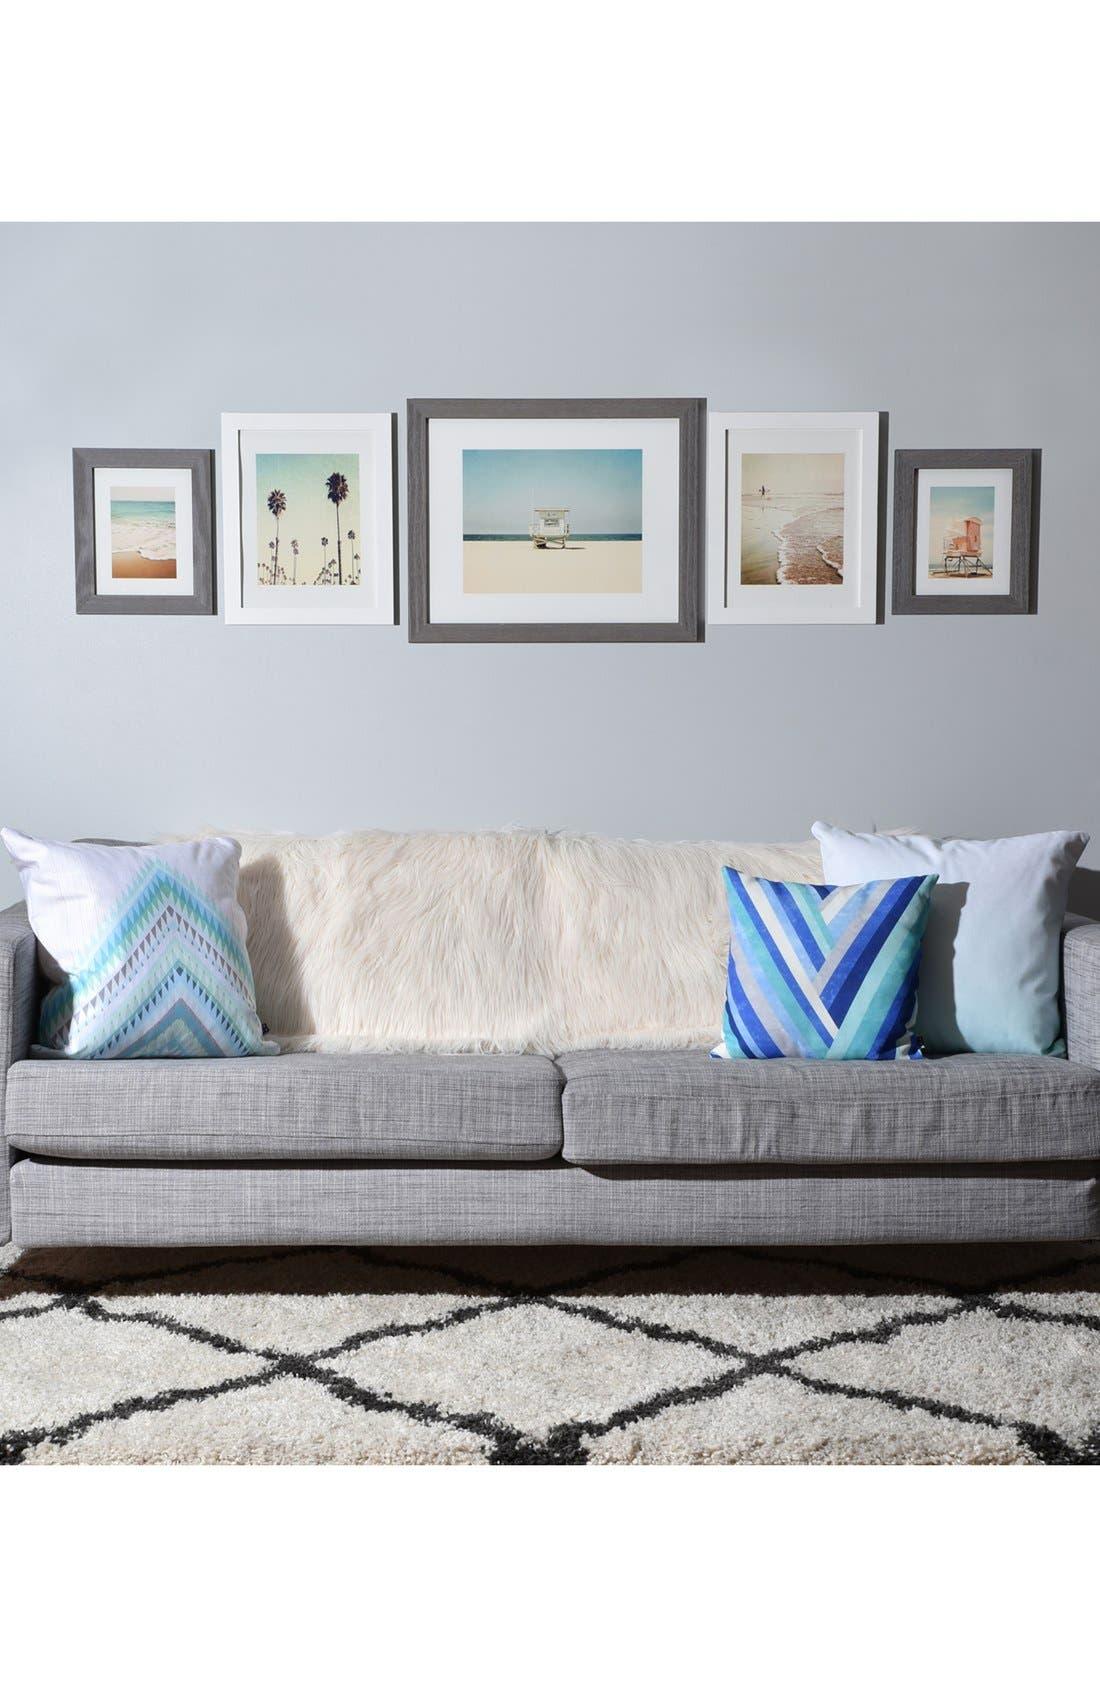 DENY DESIGNS, '5th Street' Wall Art Print Set, Alternate thumbnail 2, color, WHITE